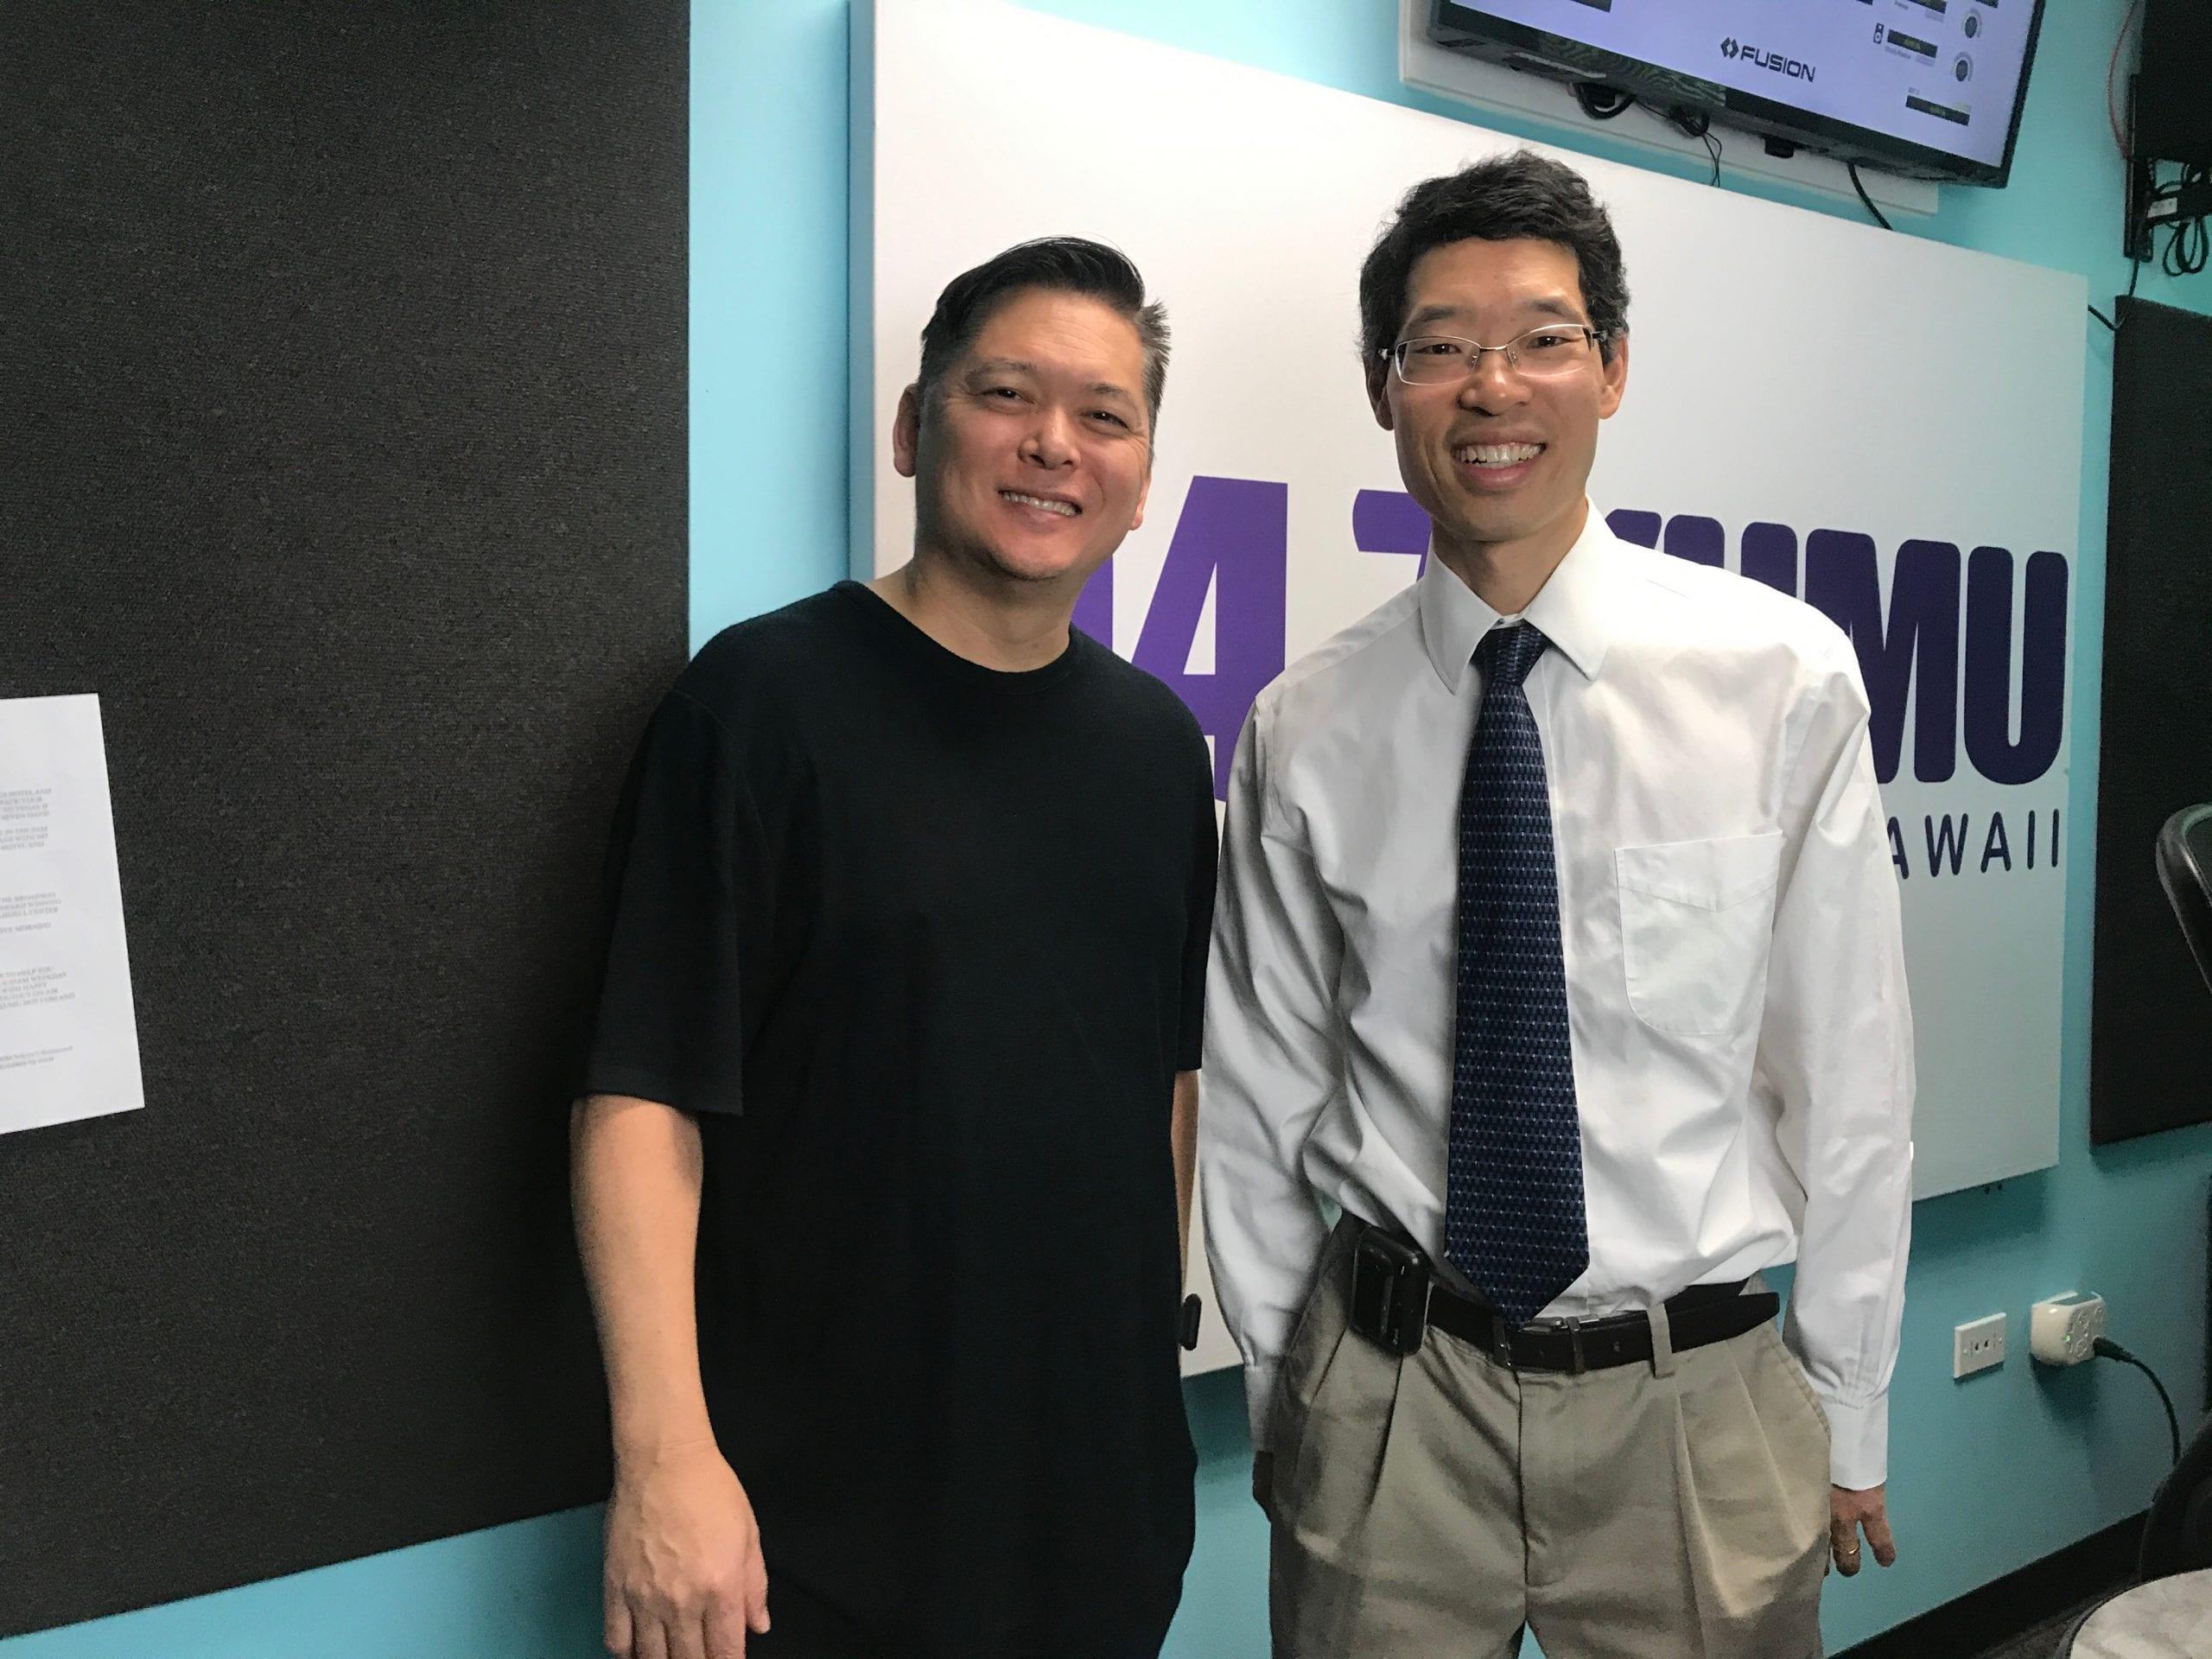 Hawaii Matters Host Devon Nekoba with Dr. Stephen Chang, Interventional Cardiologist with Kaiser Permanente